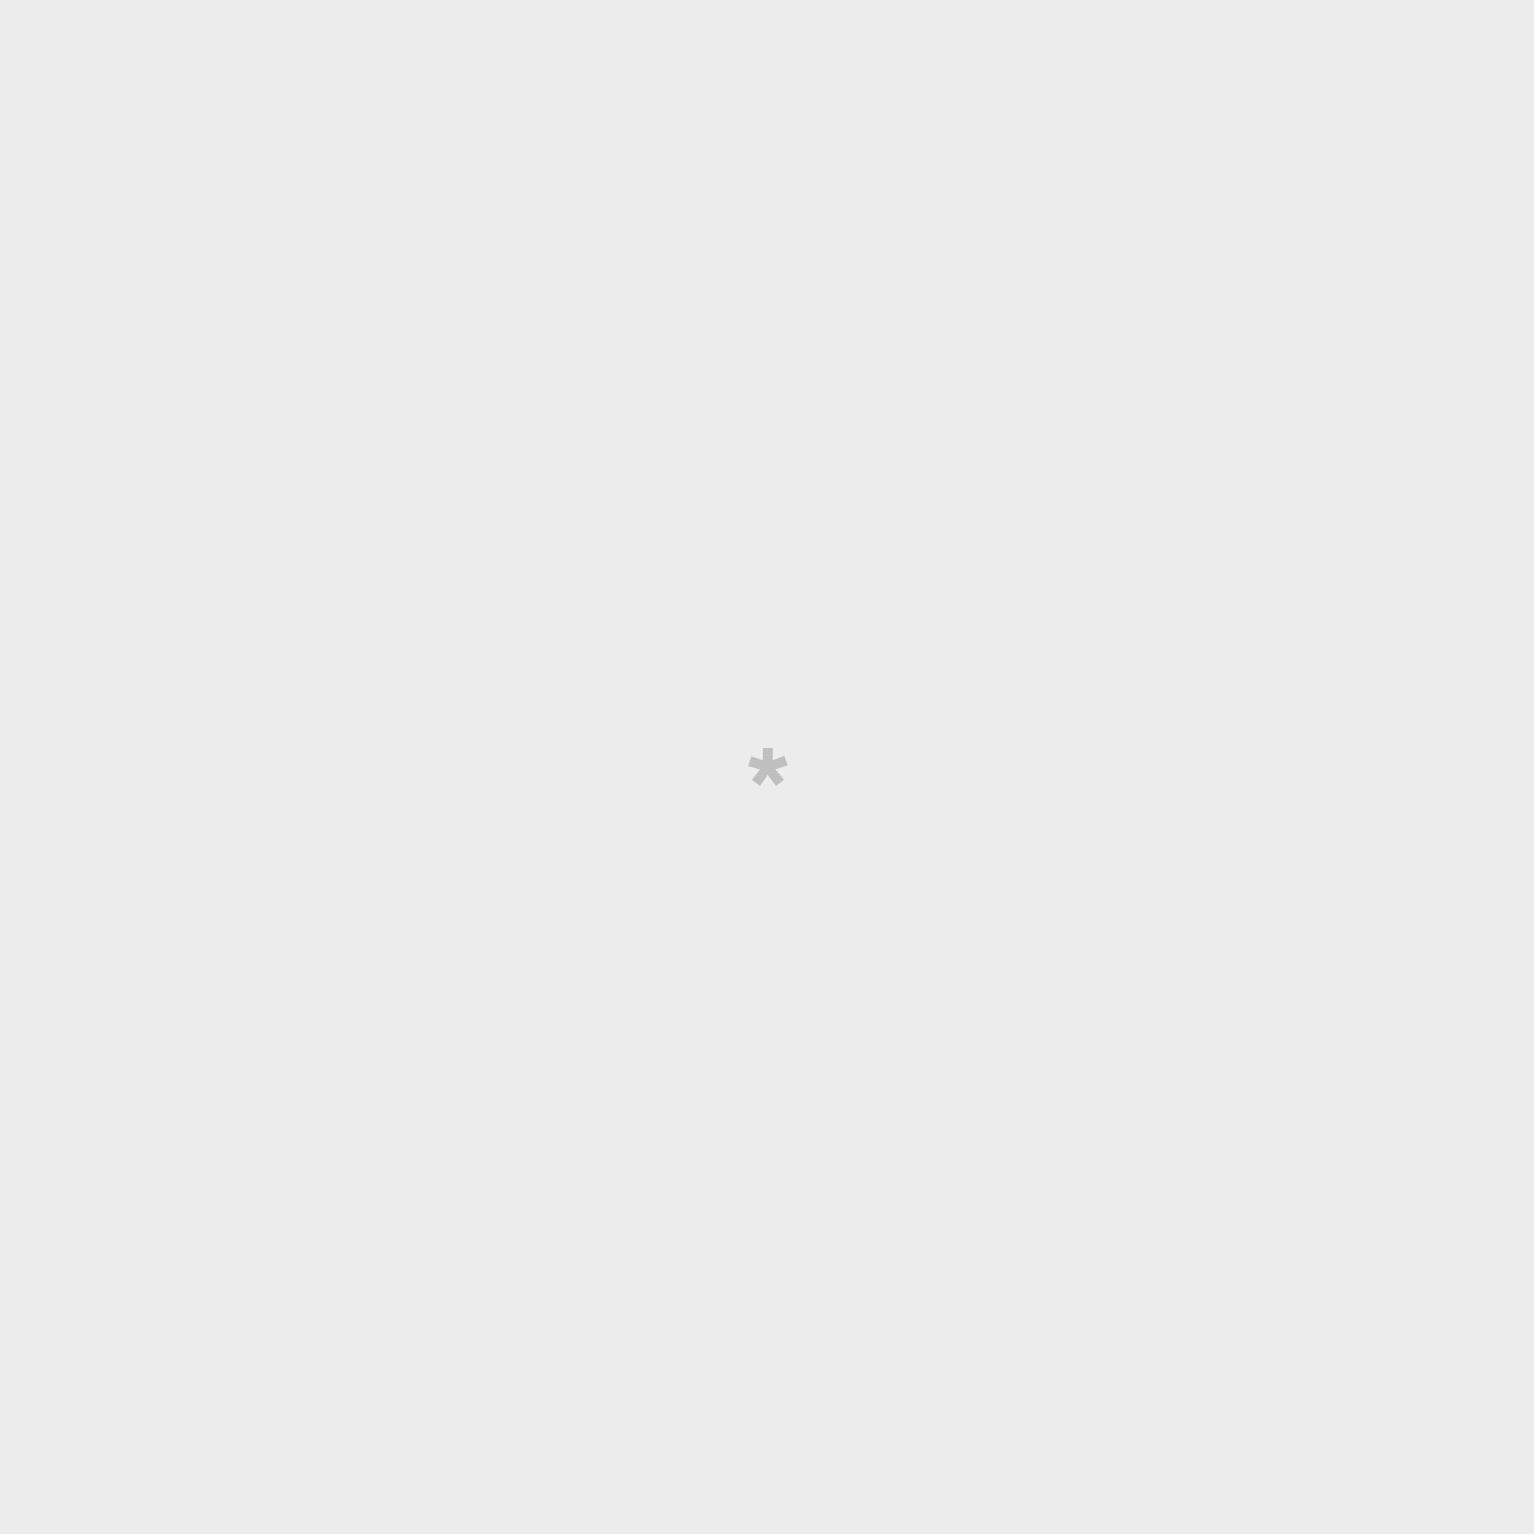 Sunglasses - Daydreaming Black